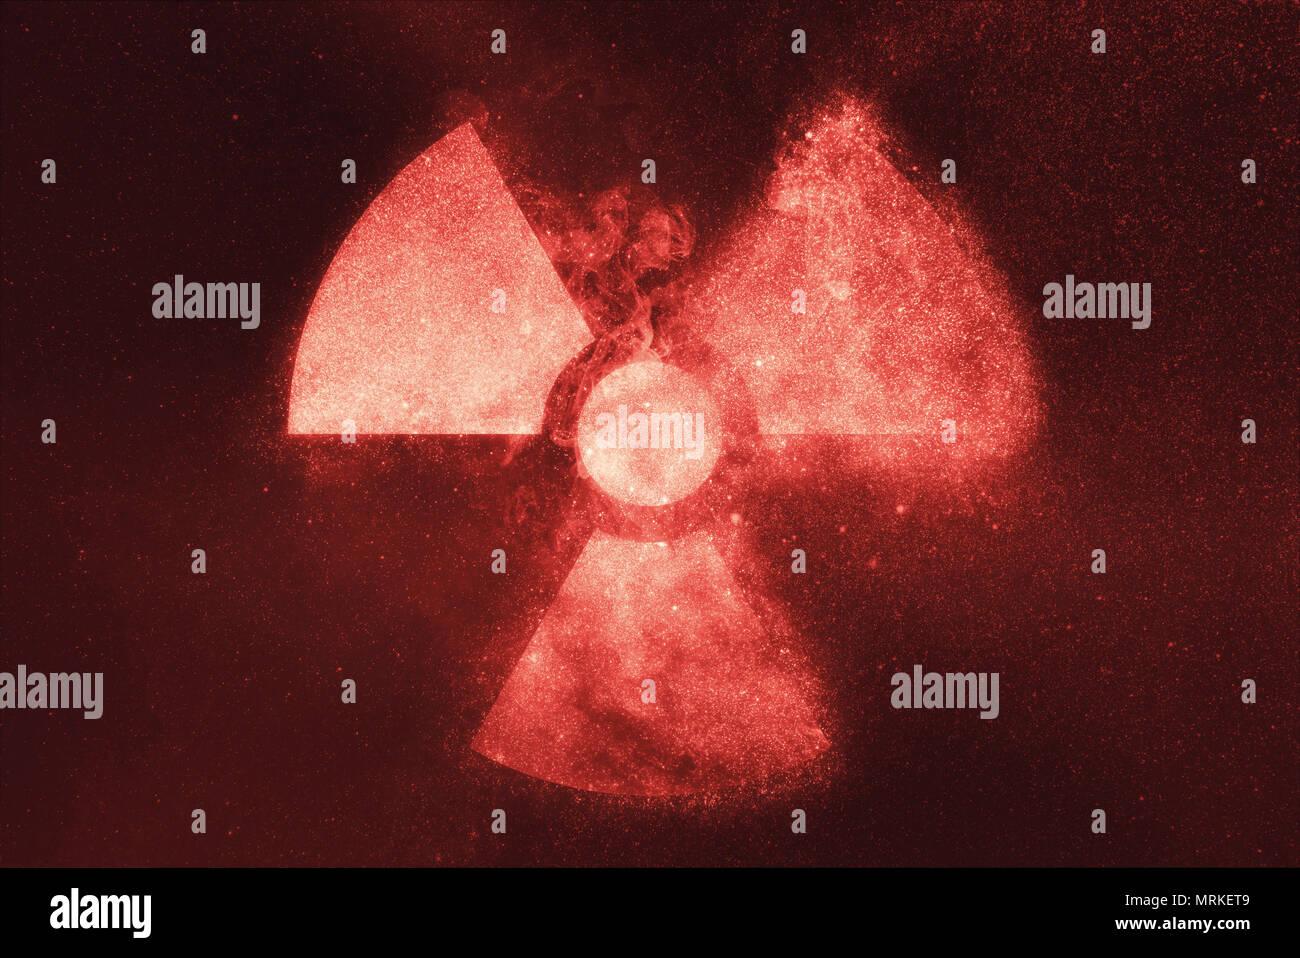 Radiation sign, Radiation symbol. Abstract night sky background - Stock Image